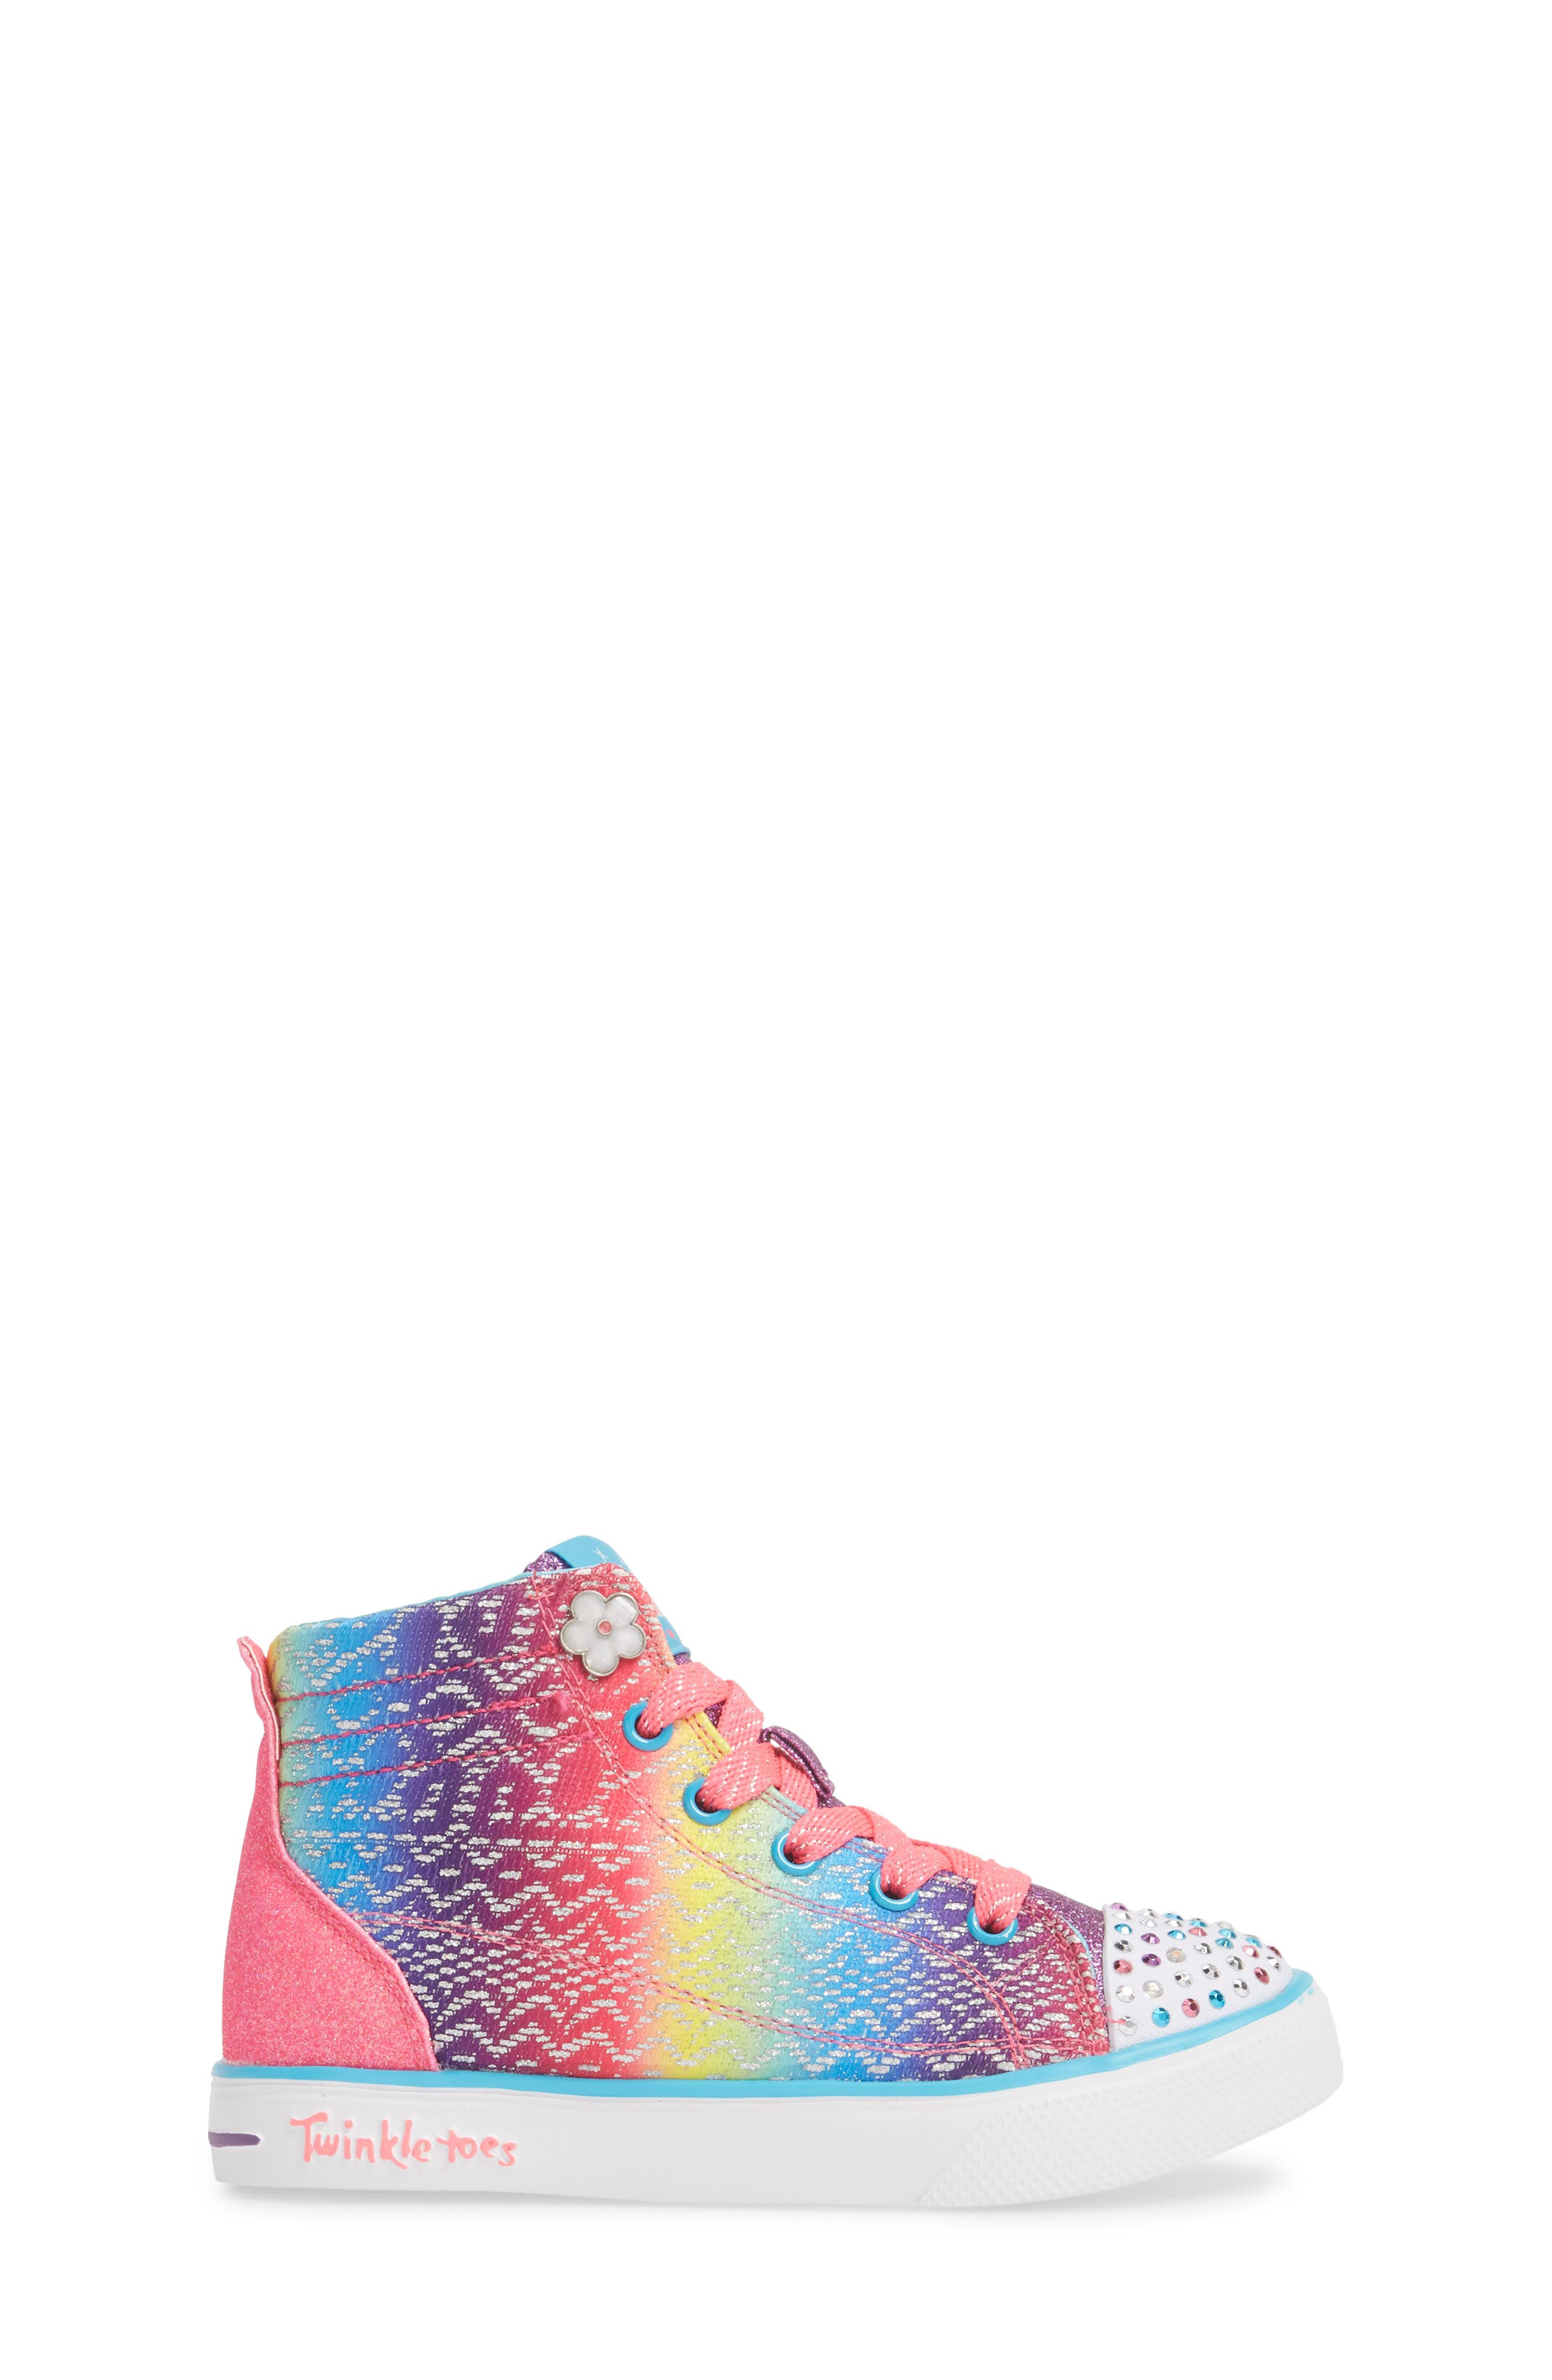 Alternate Image 3  - SKECHERS Twinkle Toes Breeze 2.0 Light-Up High Top Sneaker (Toddler, Little Kid & Big Kid)